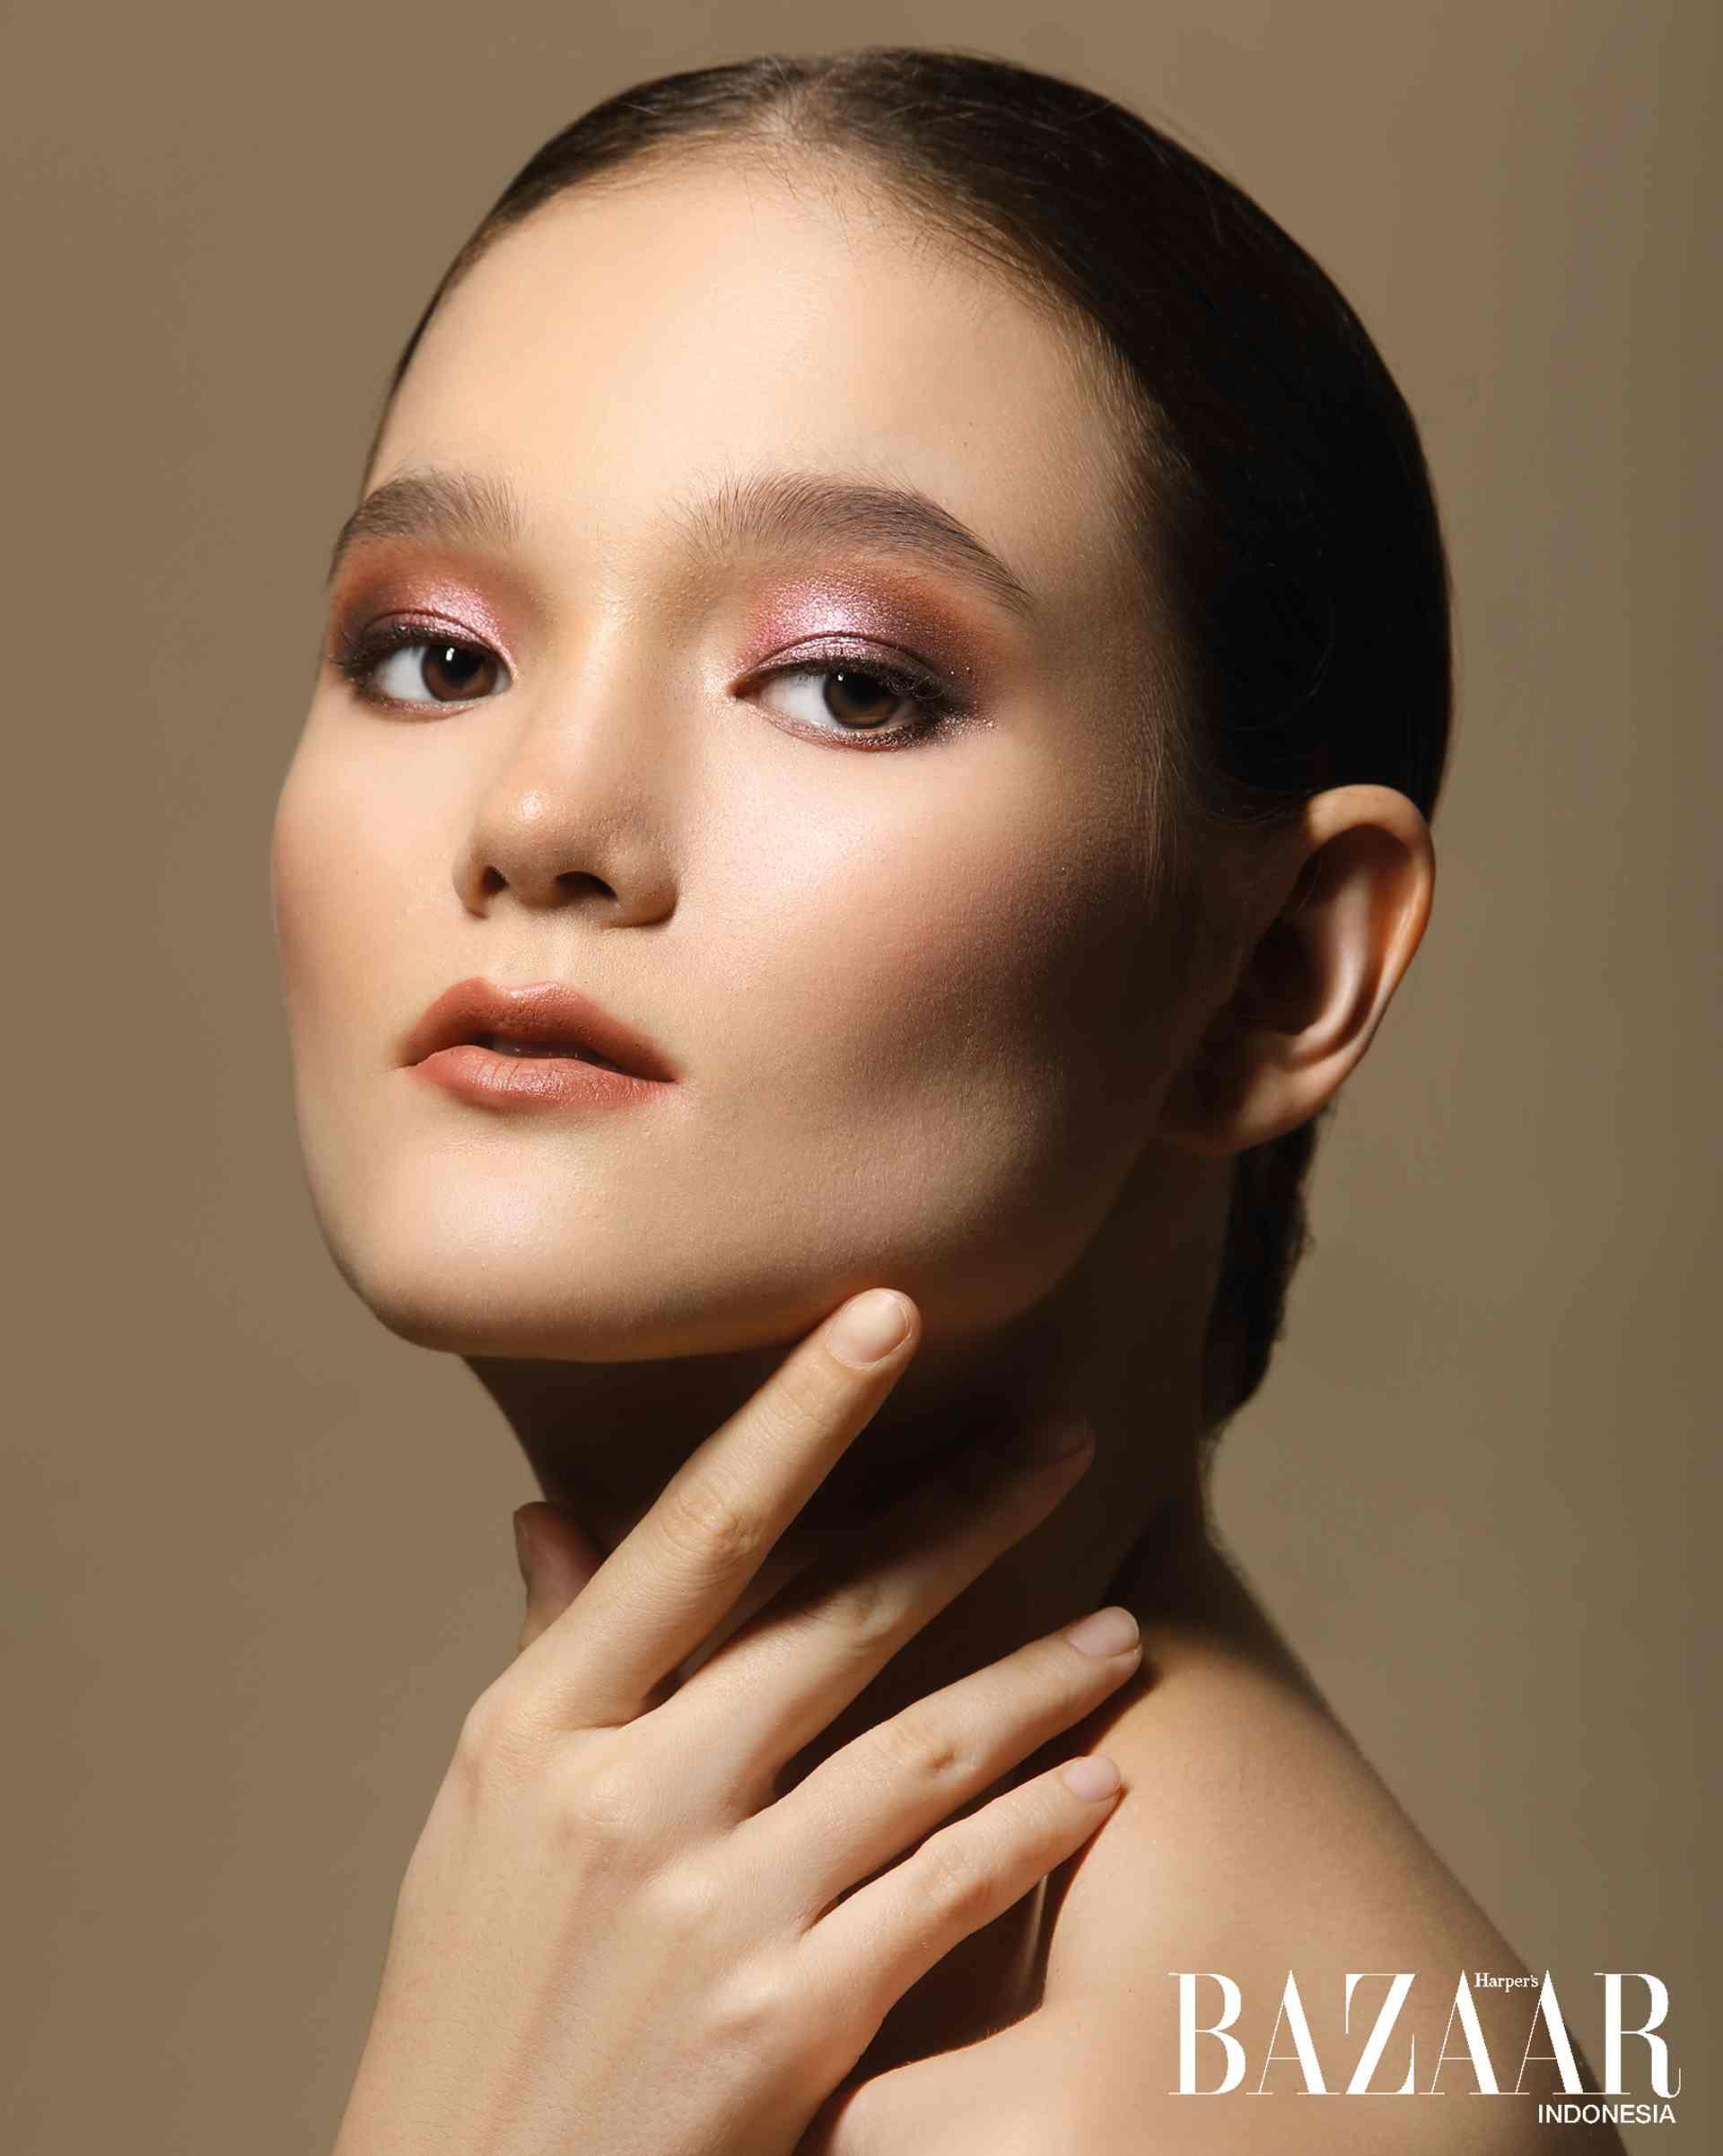 Daftar Pemenang Bazaar Beauty Awards 2019-2020